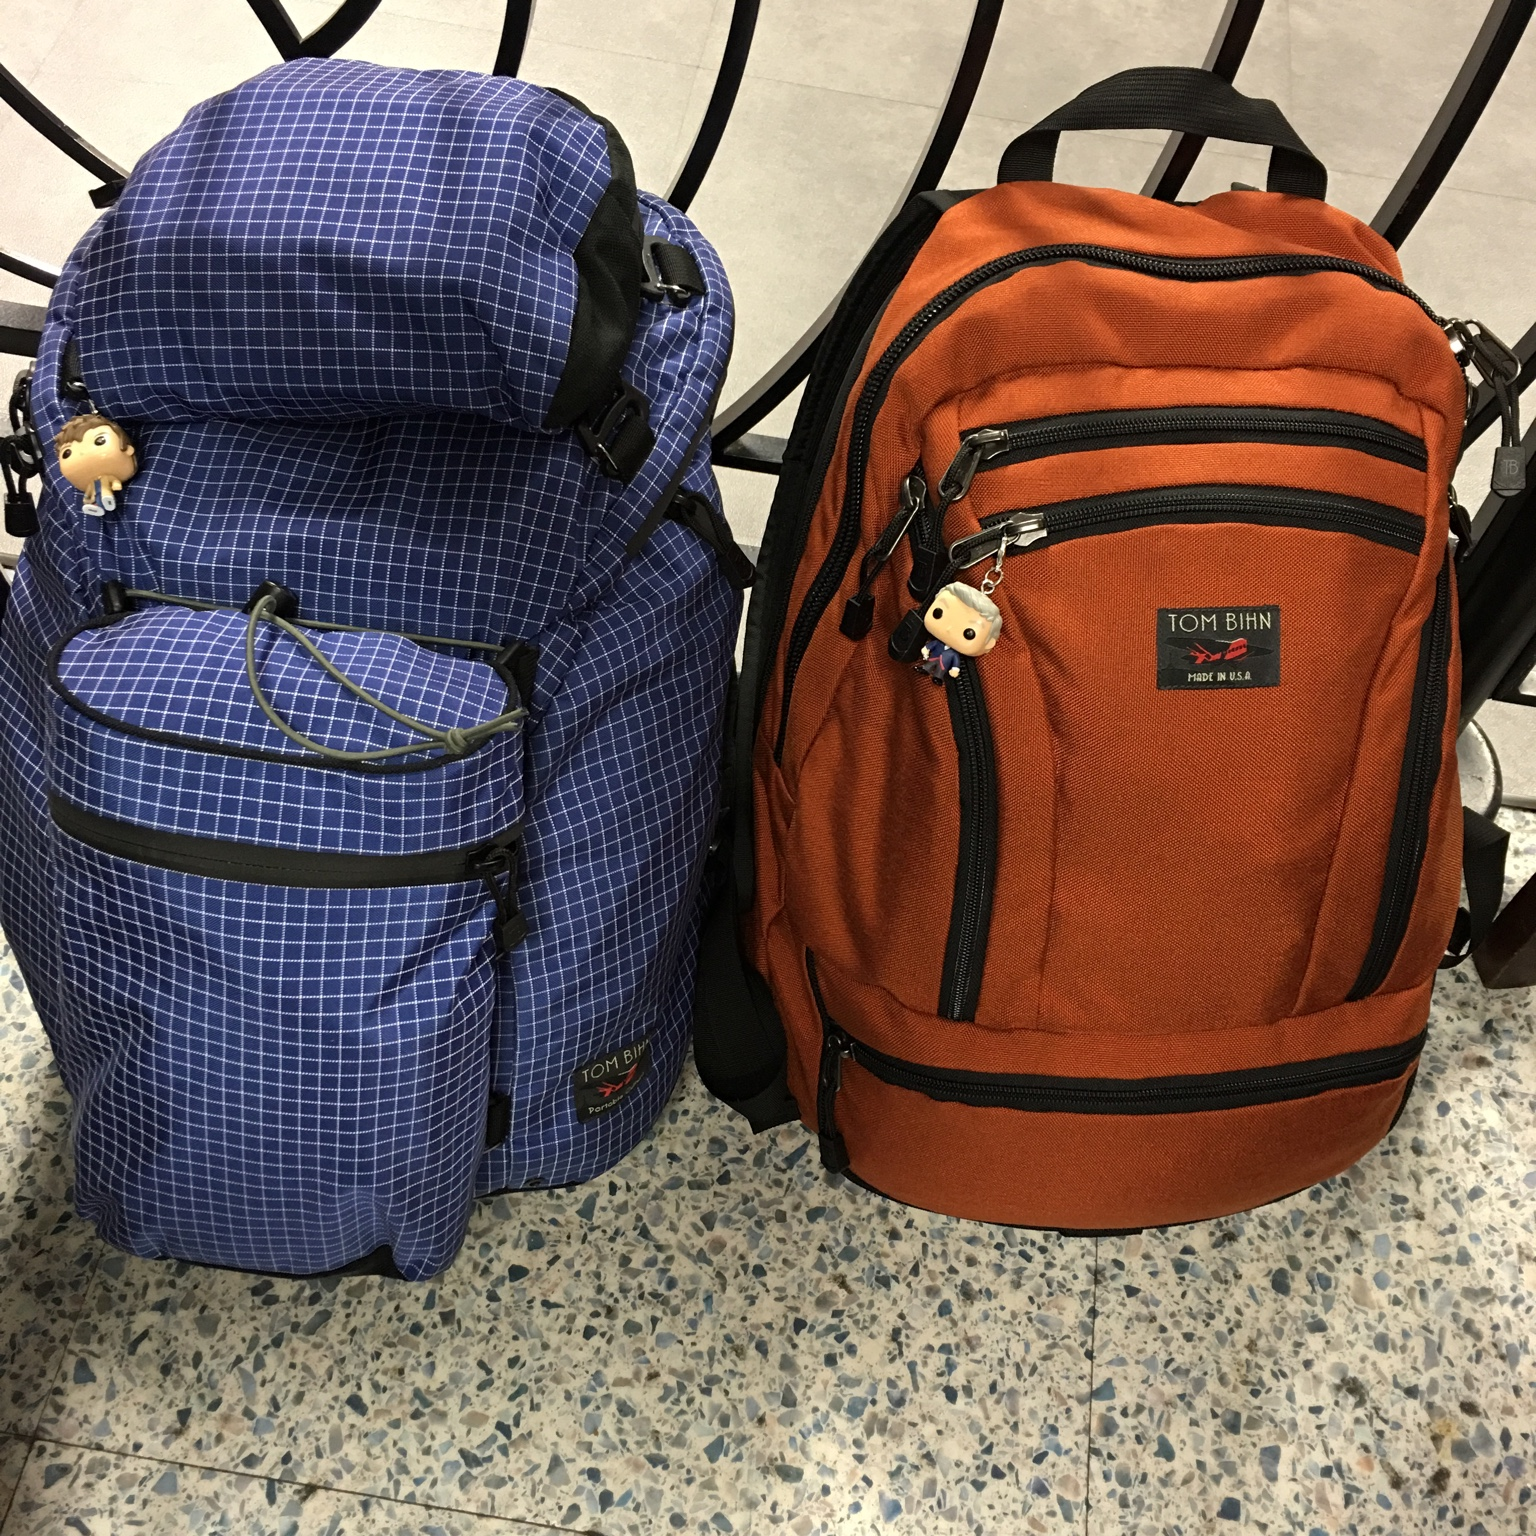 Aeronaut Backpack: Iceland(air) Packing List: One Week, One Aeronaut; Many